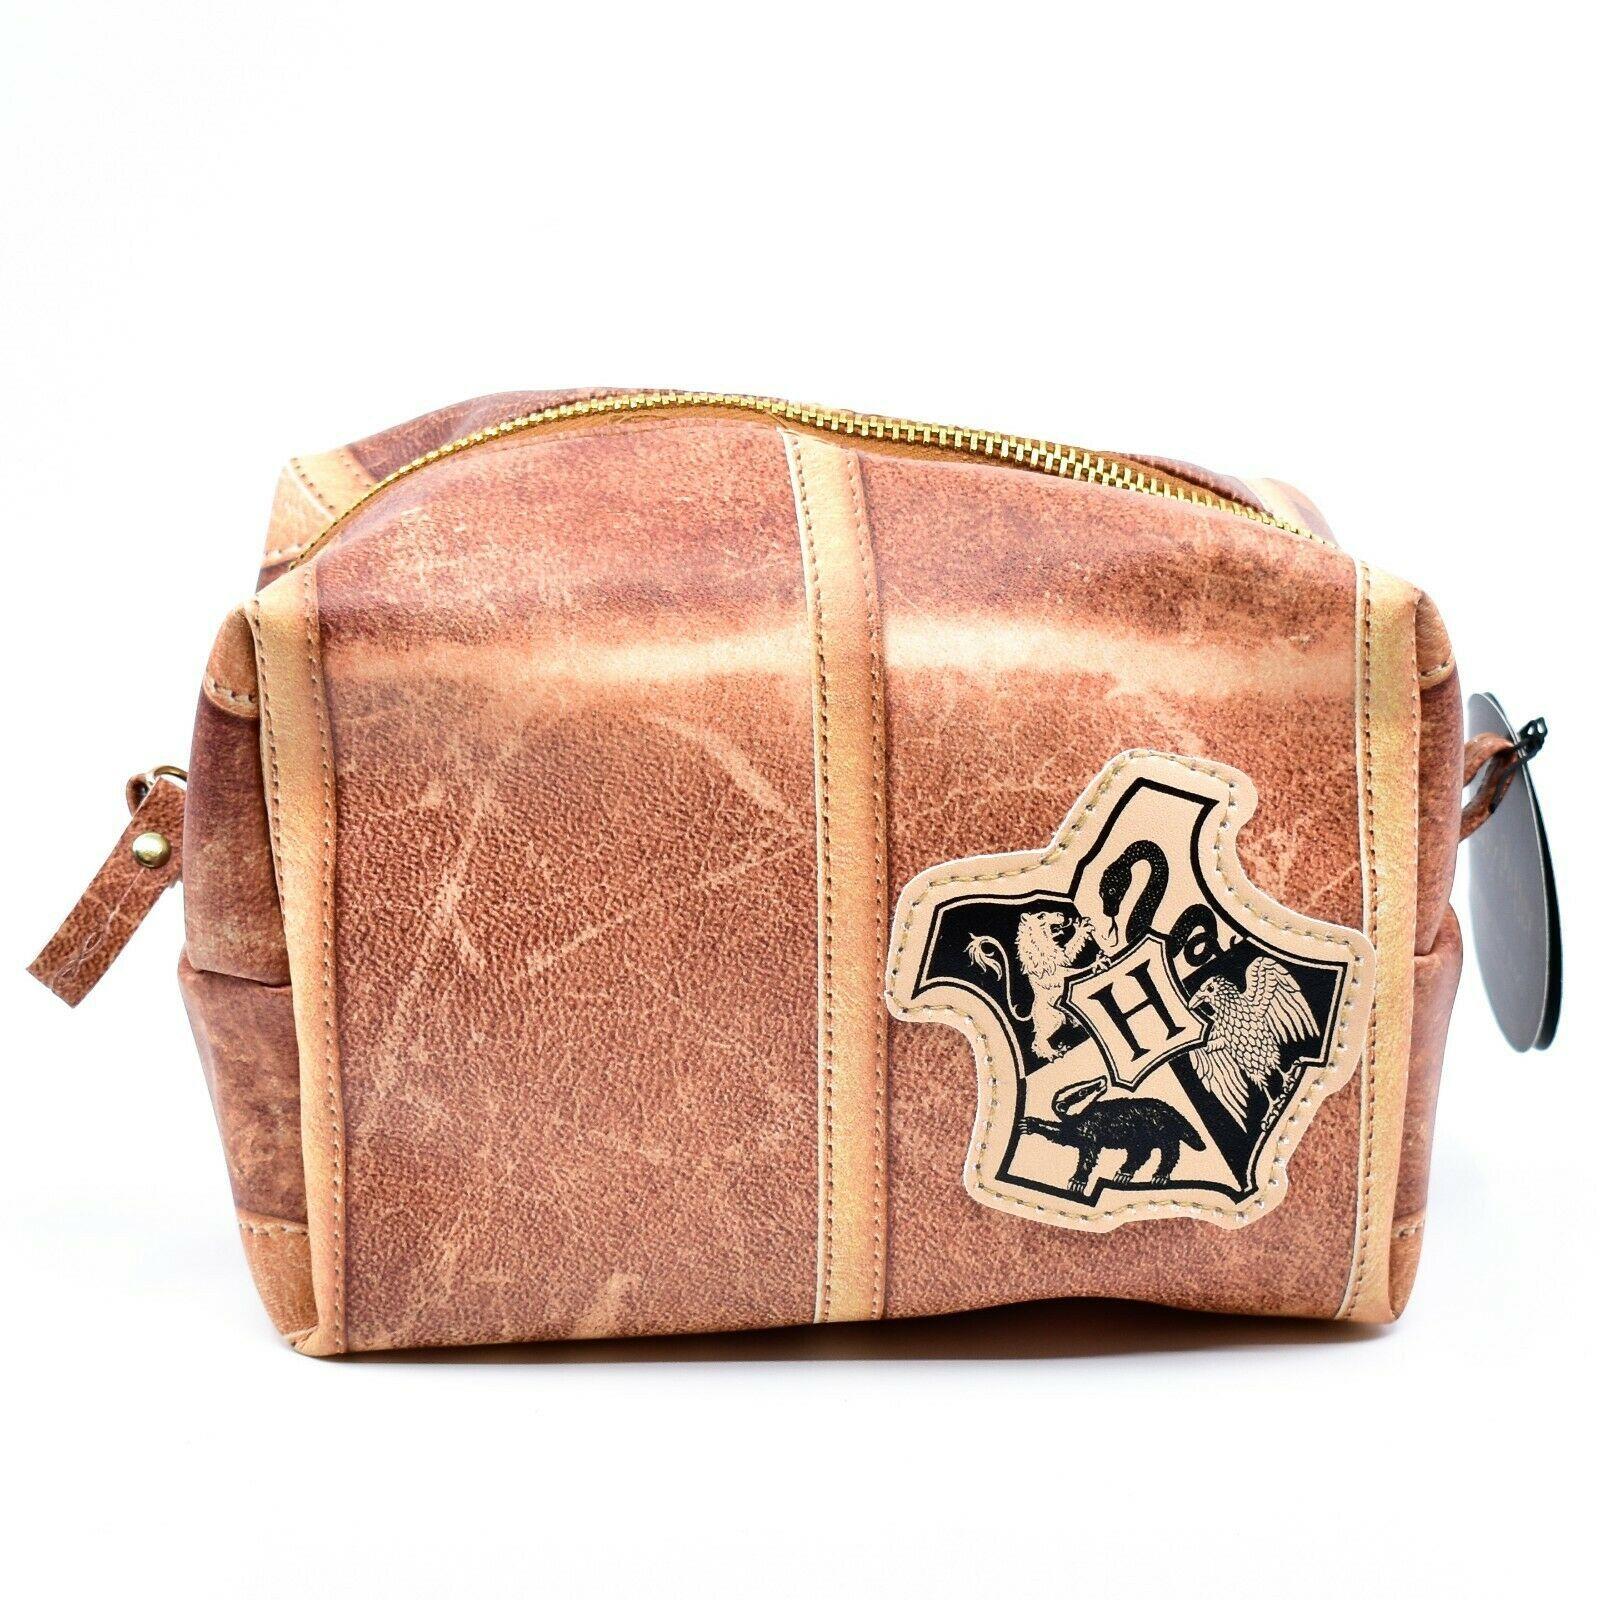 Harry Potter Hogwarts Theme Zippered Toiletry Makeup Accessory Bag